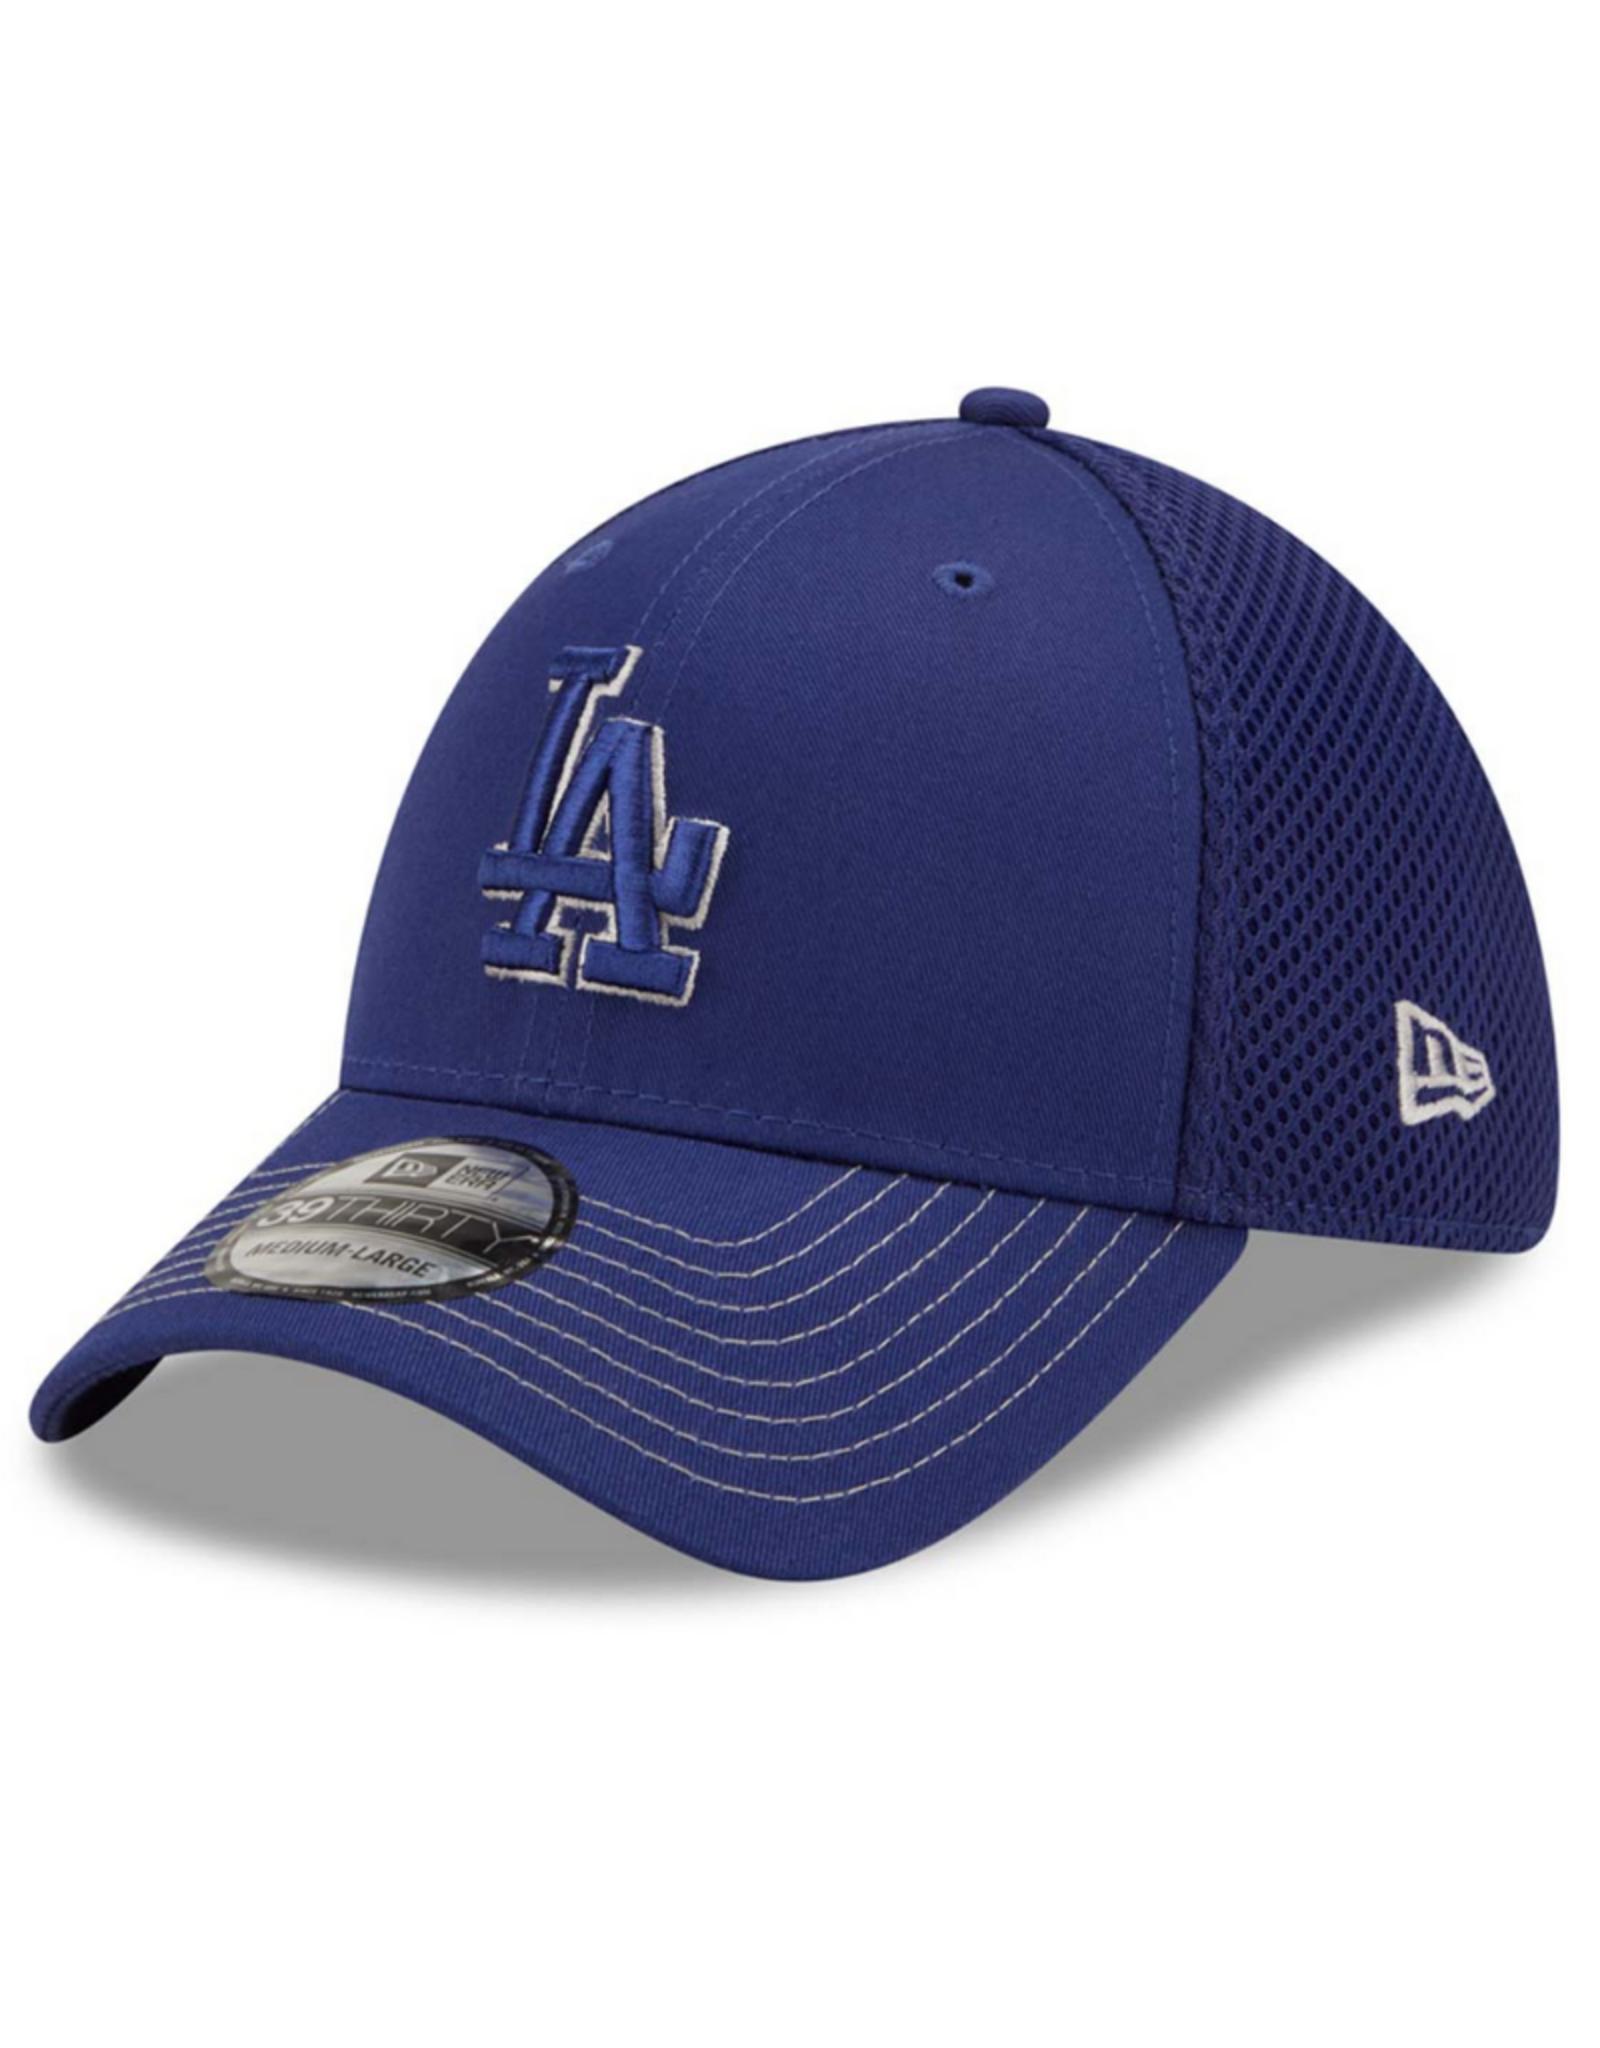 New Era Men's 39THIRTY Team Neo C1 Hat Los Angeles Dodgers Blue